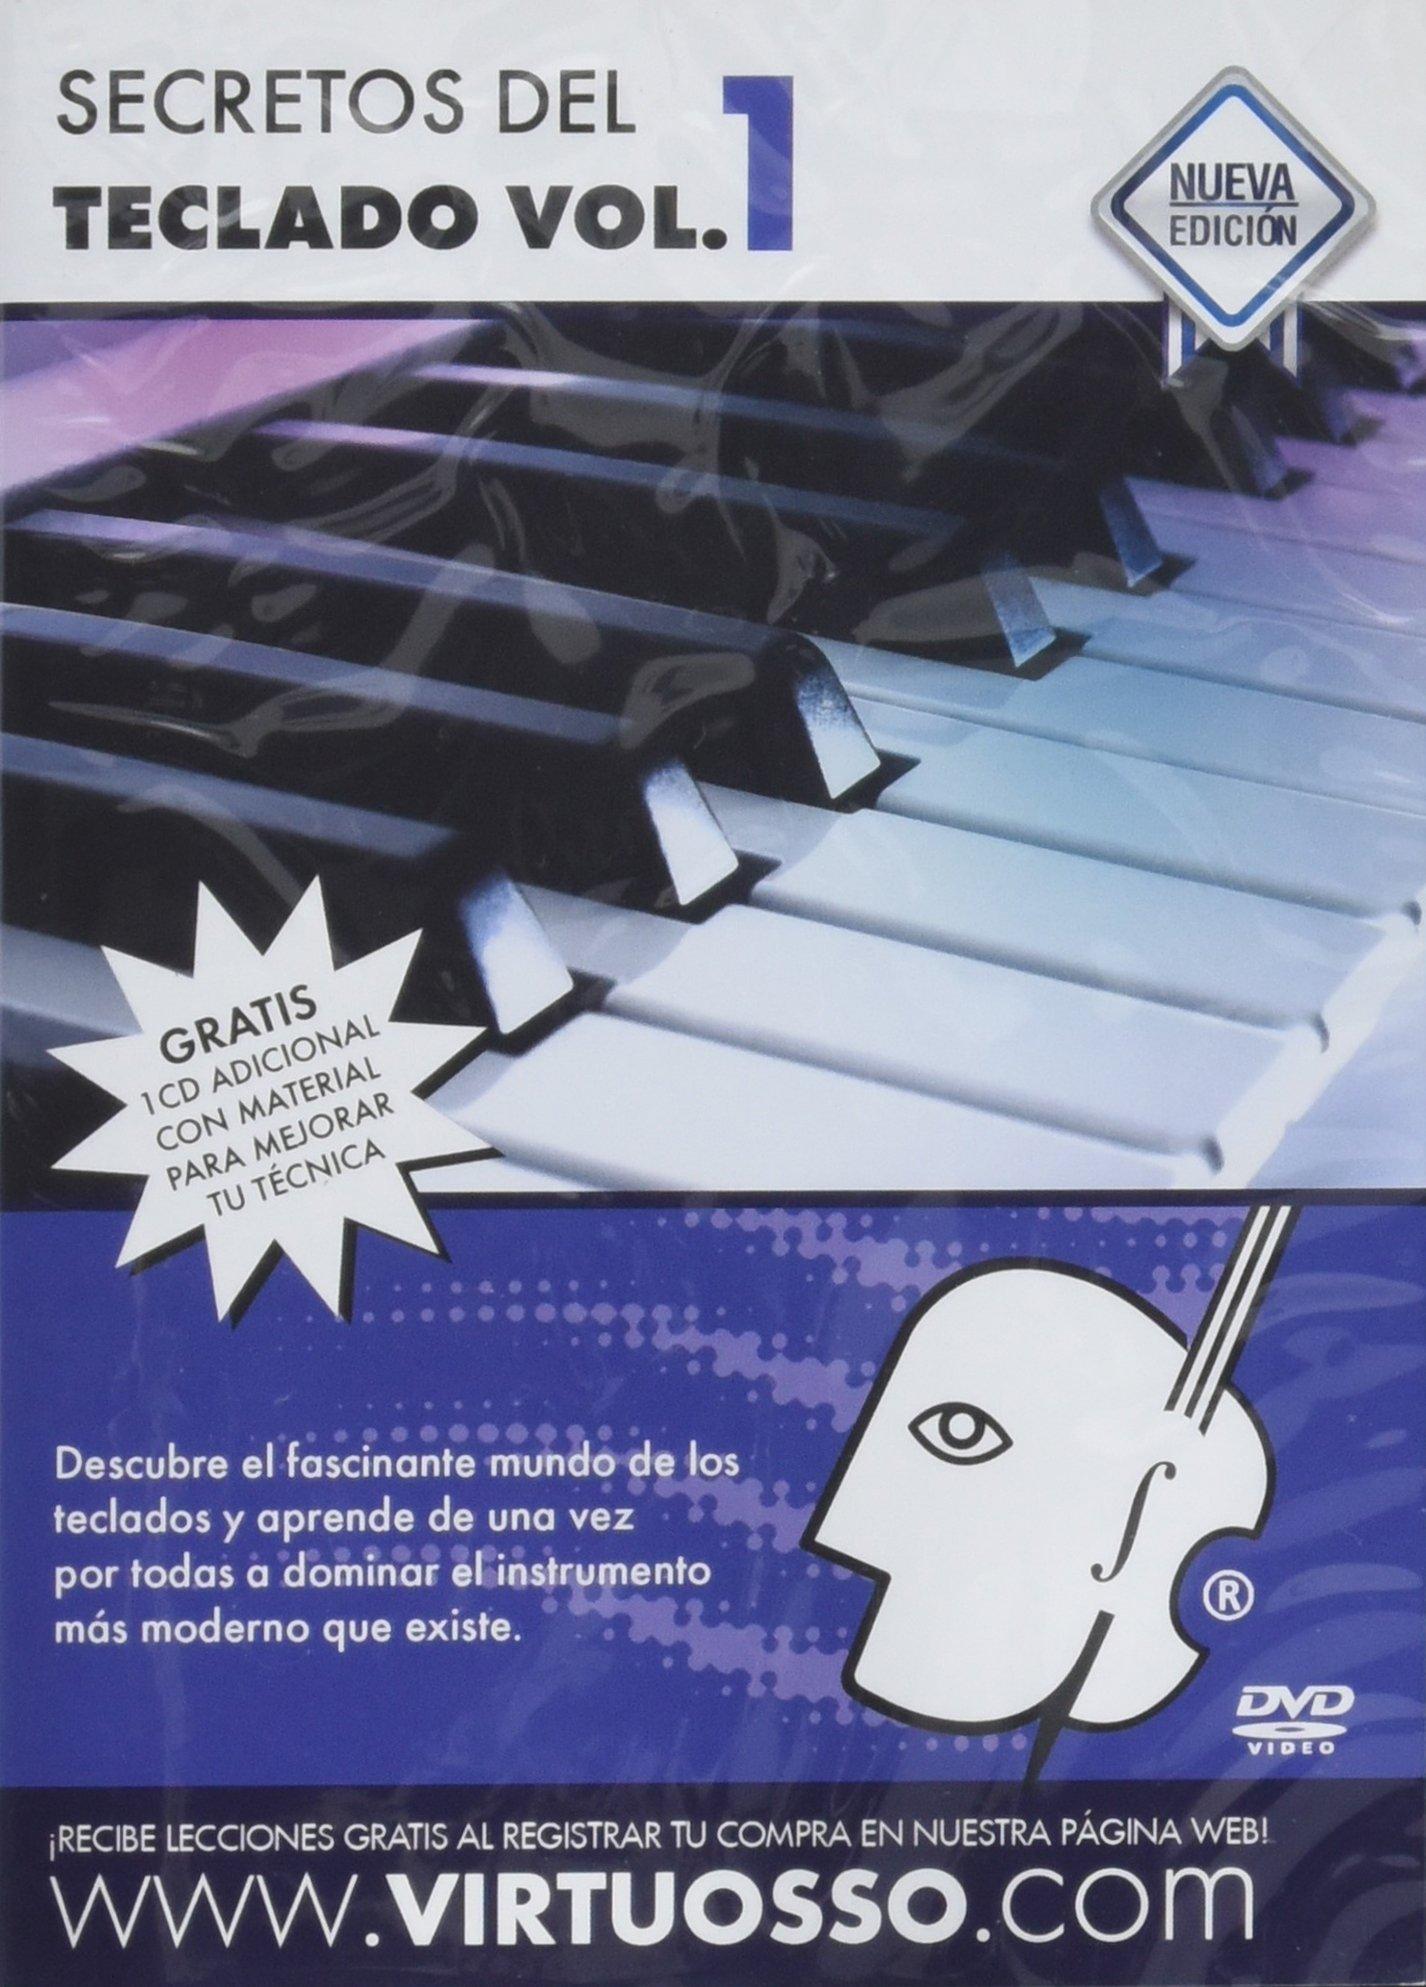 Virtuosso Musical Keyboard Method for Beginners Vol.1 (Curso De Teclados Para Principiantes Vol.1) SPANISH ONLY by Virtuosso